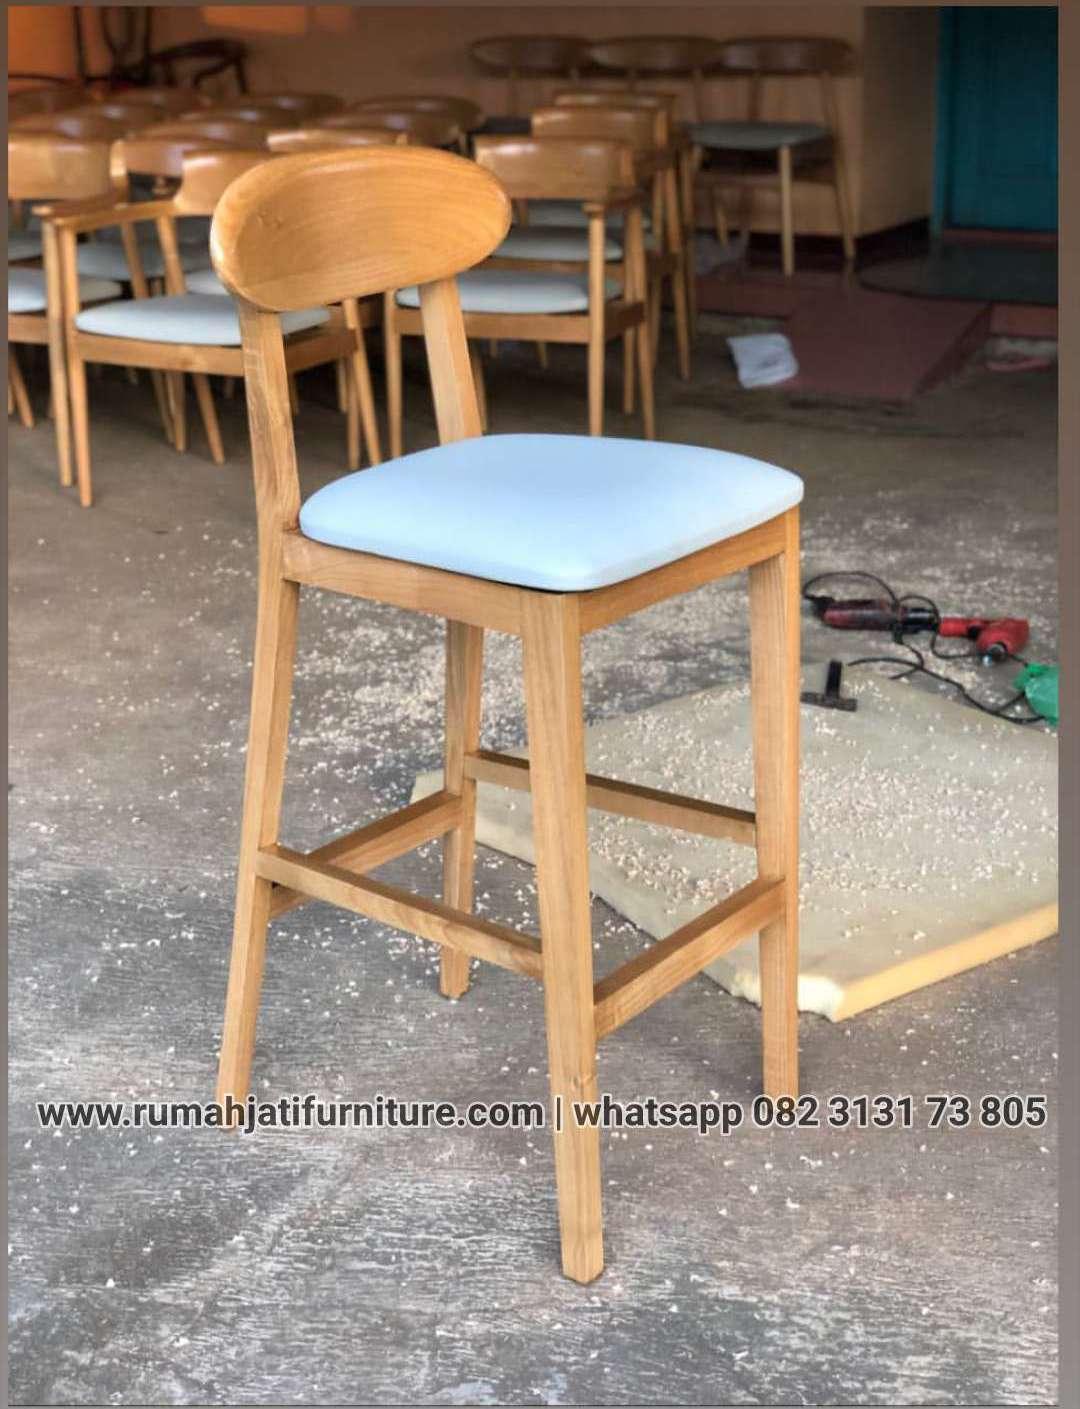 Gambar Kursi Bar Natural Kayu Sungkai |RUMAH JATI FURNITURE